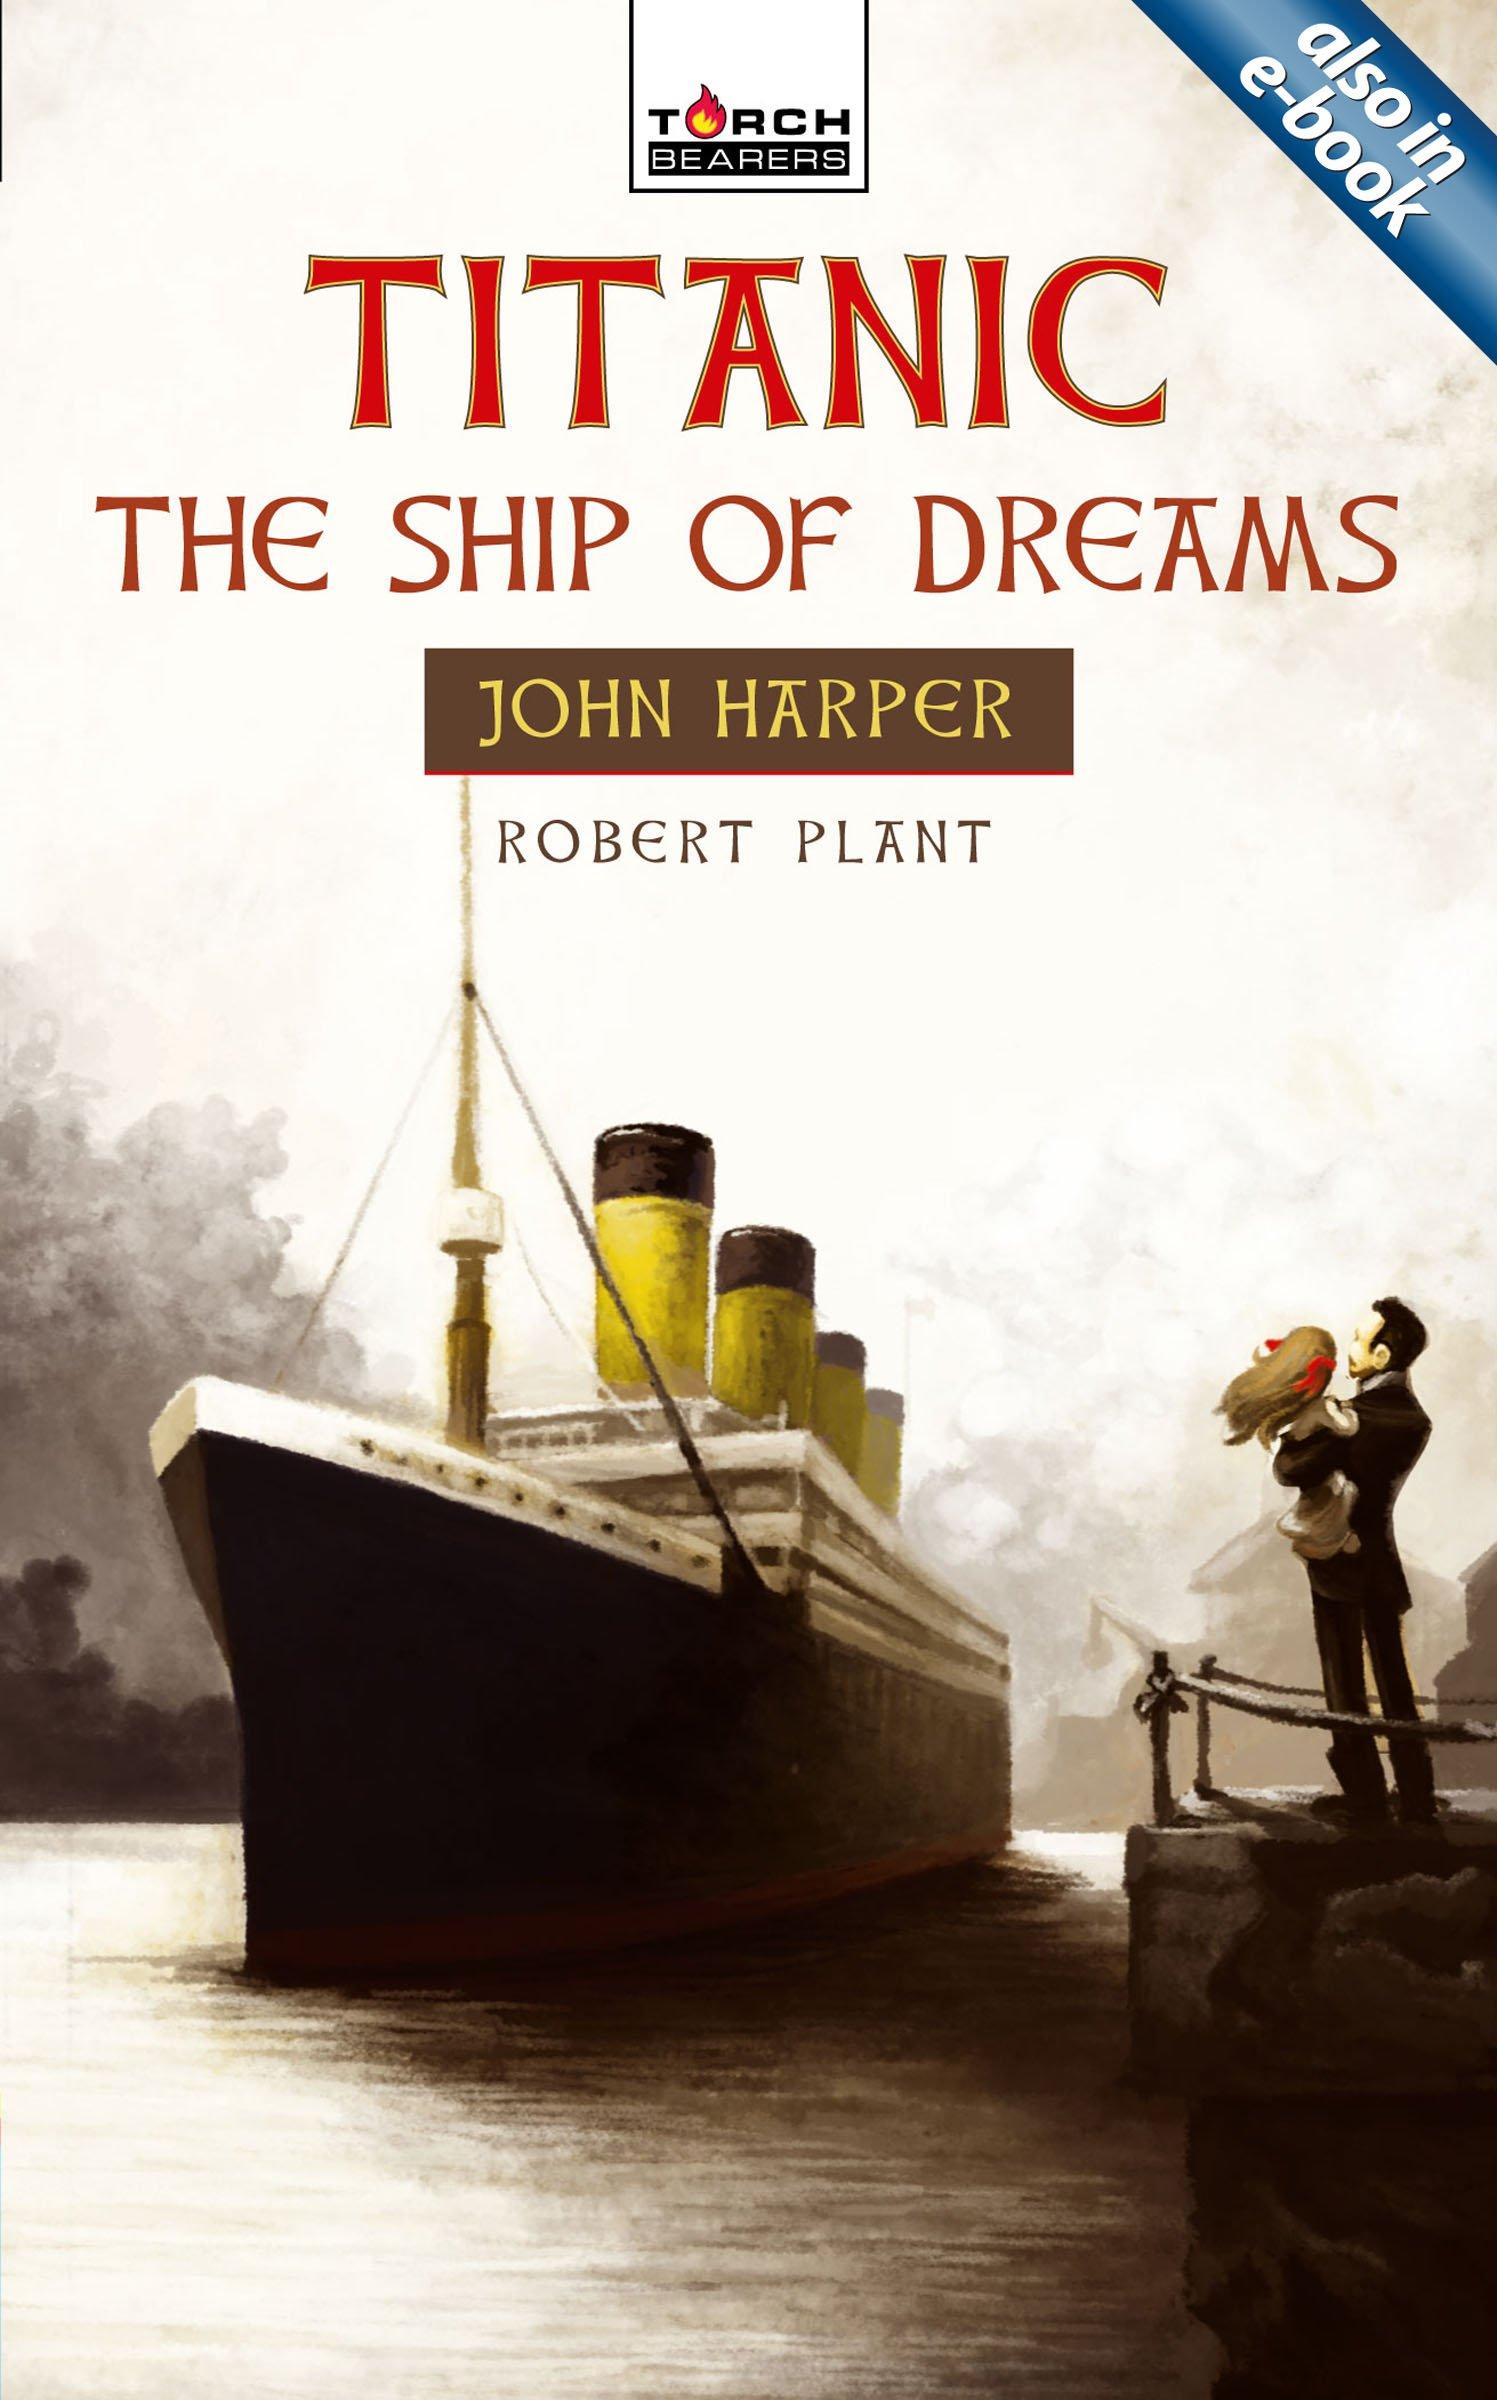 titanic the ship of dreams torchbearers robert plant